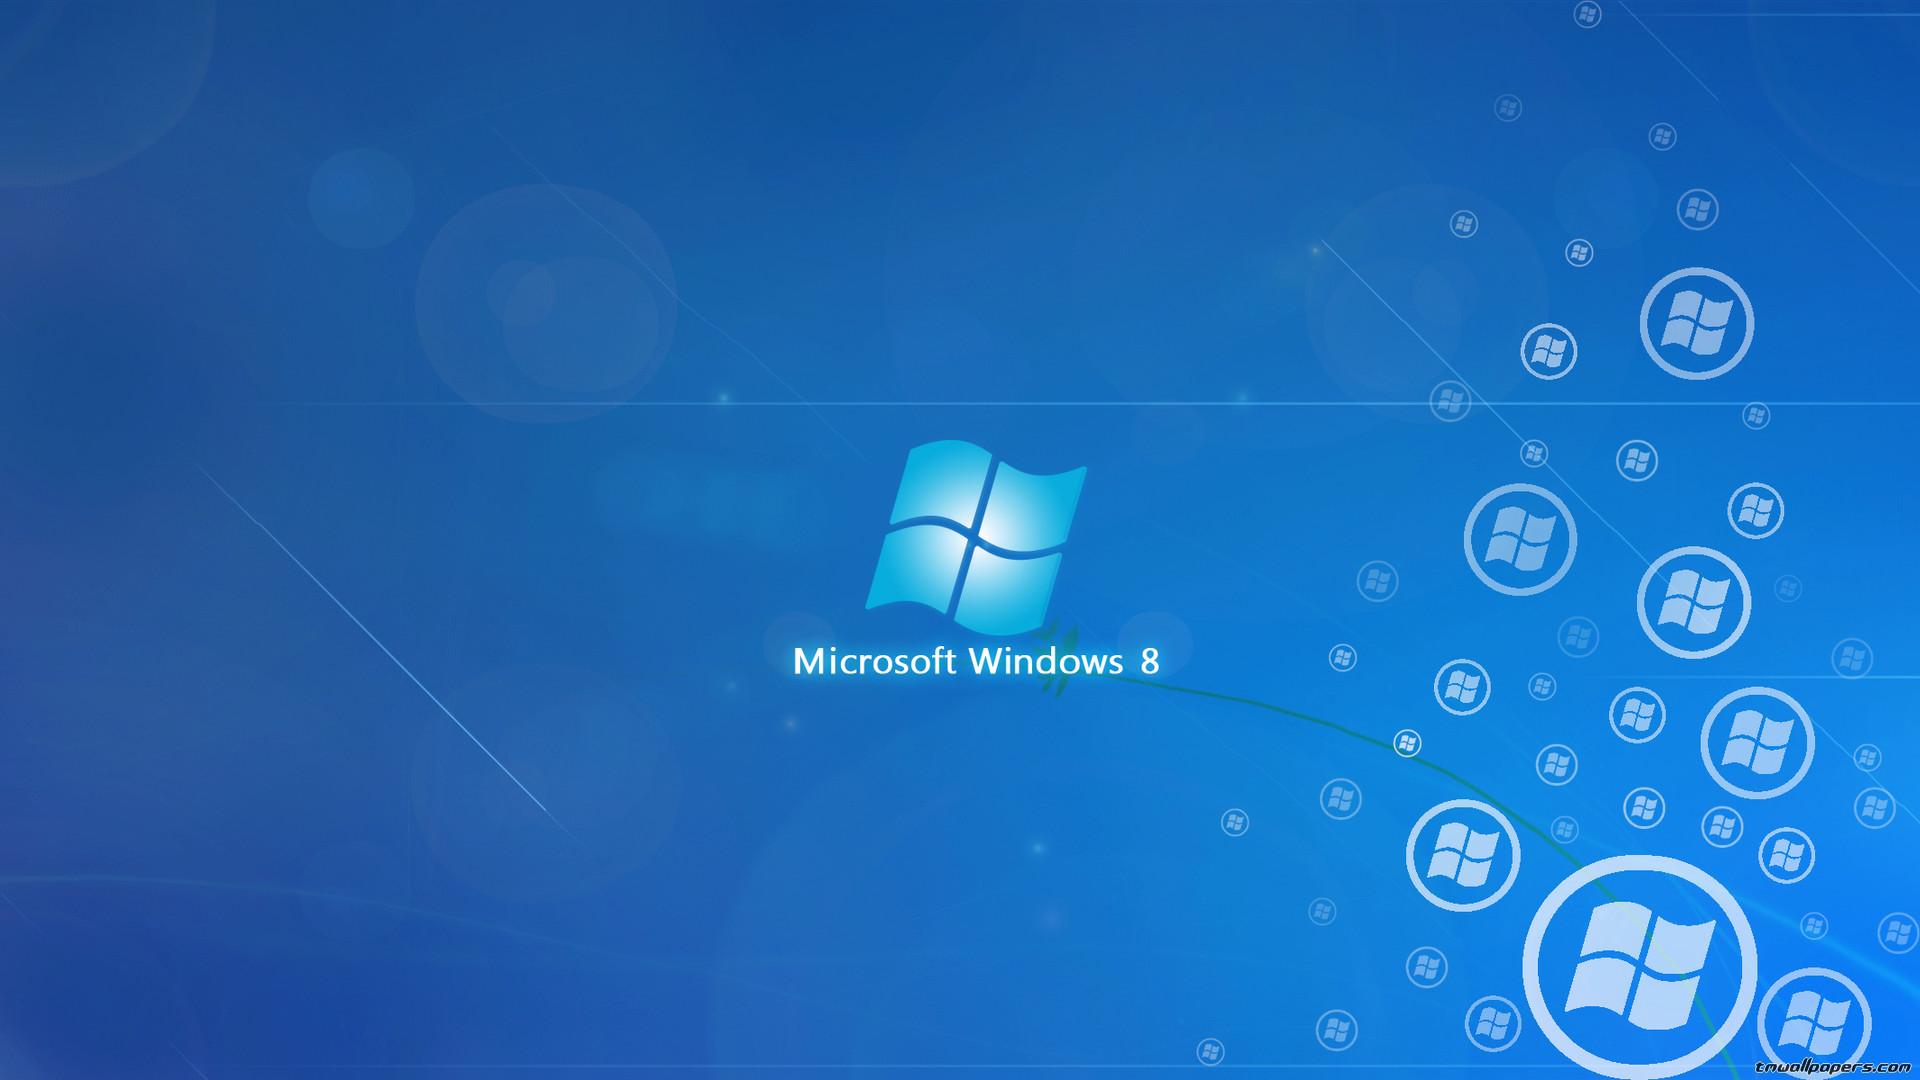 Windows 8 Wallpaper 1920x1080 78 Pictures